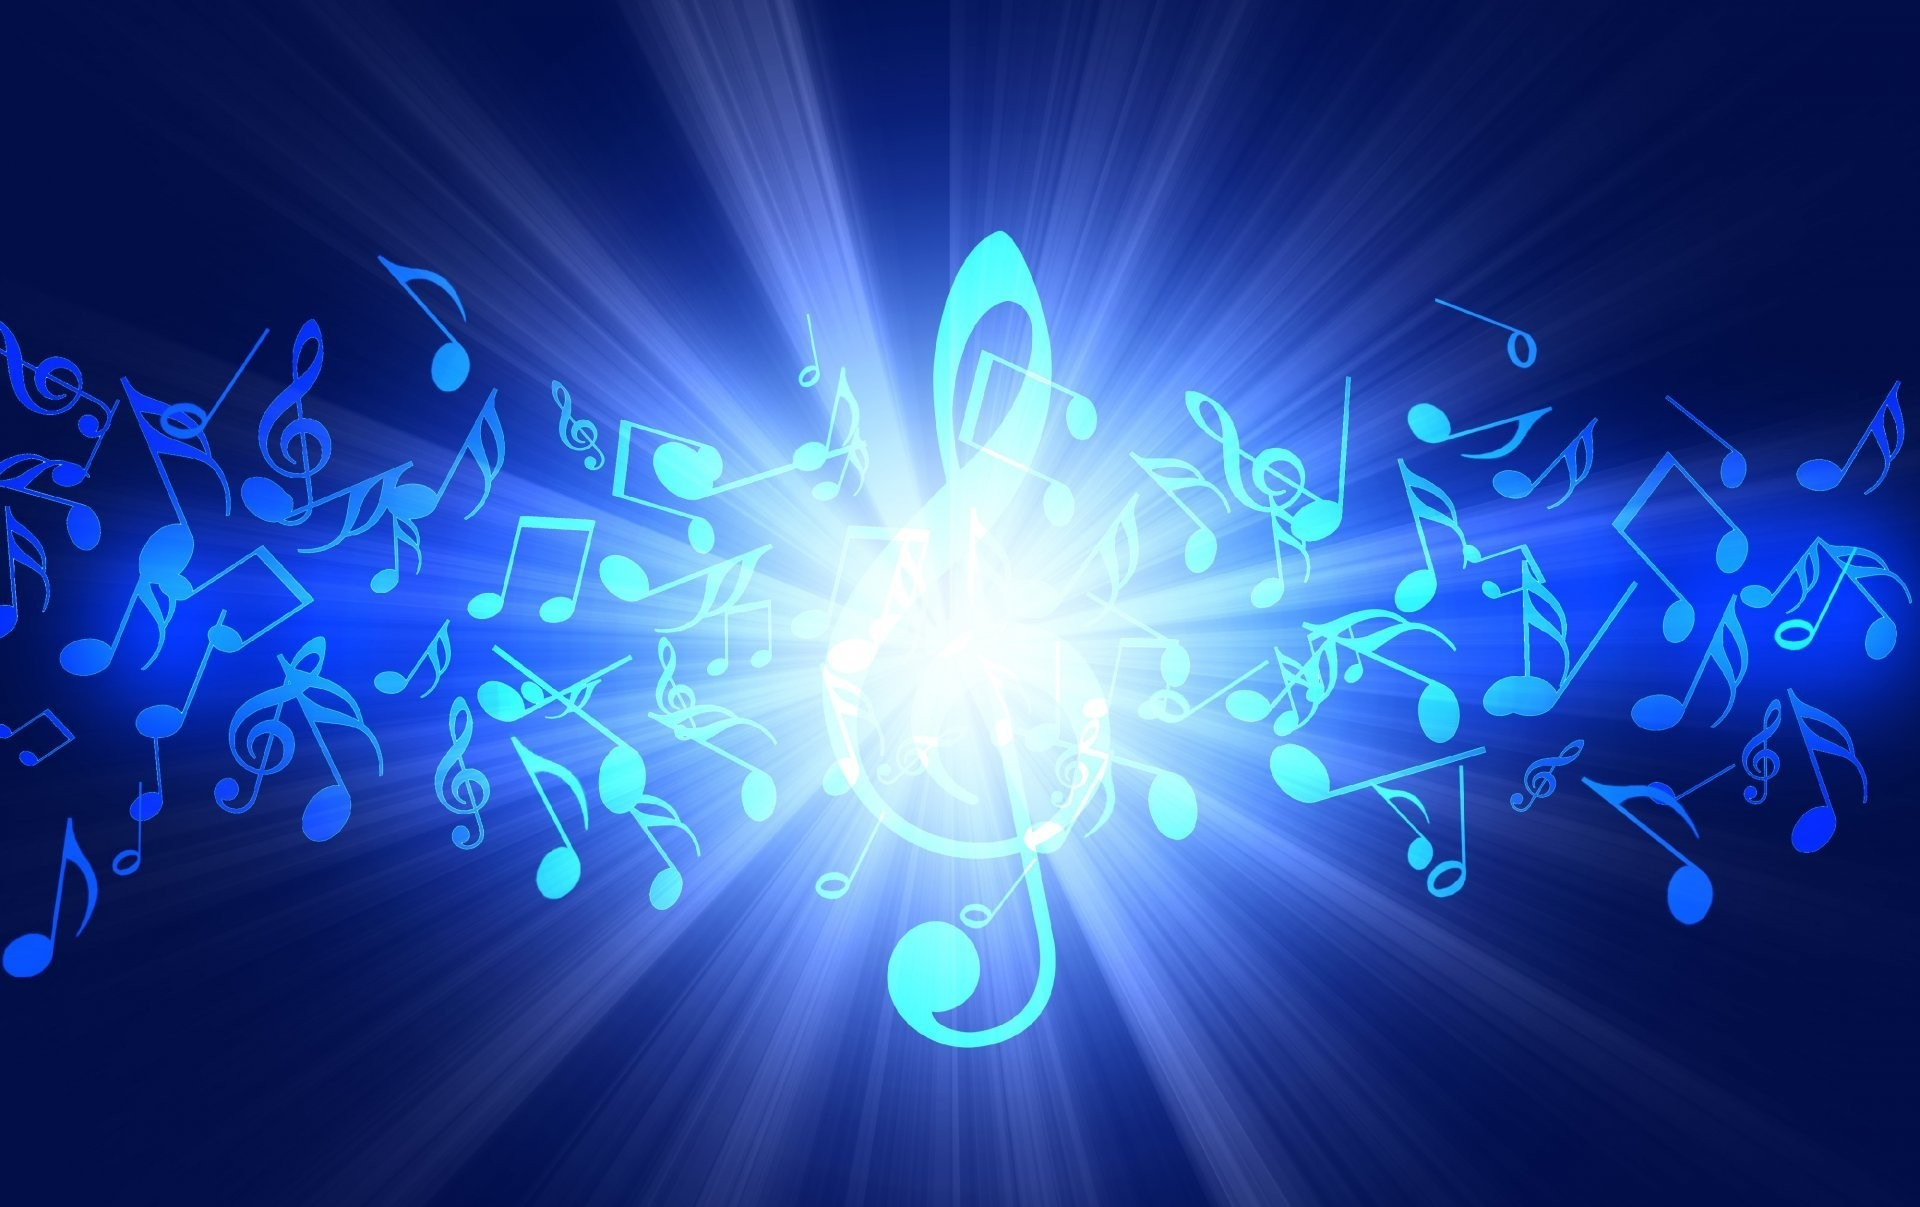 sound music notes treble clef